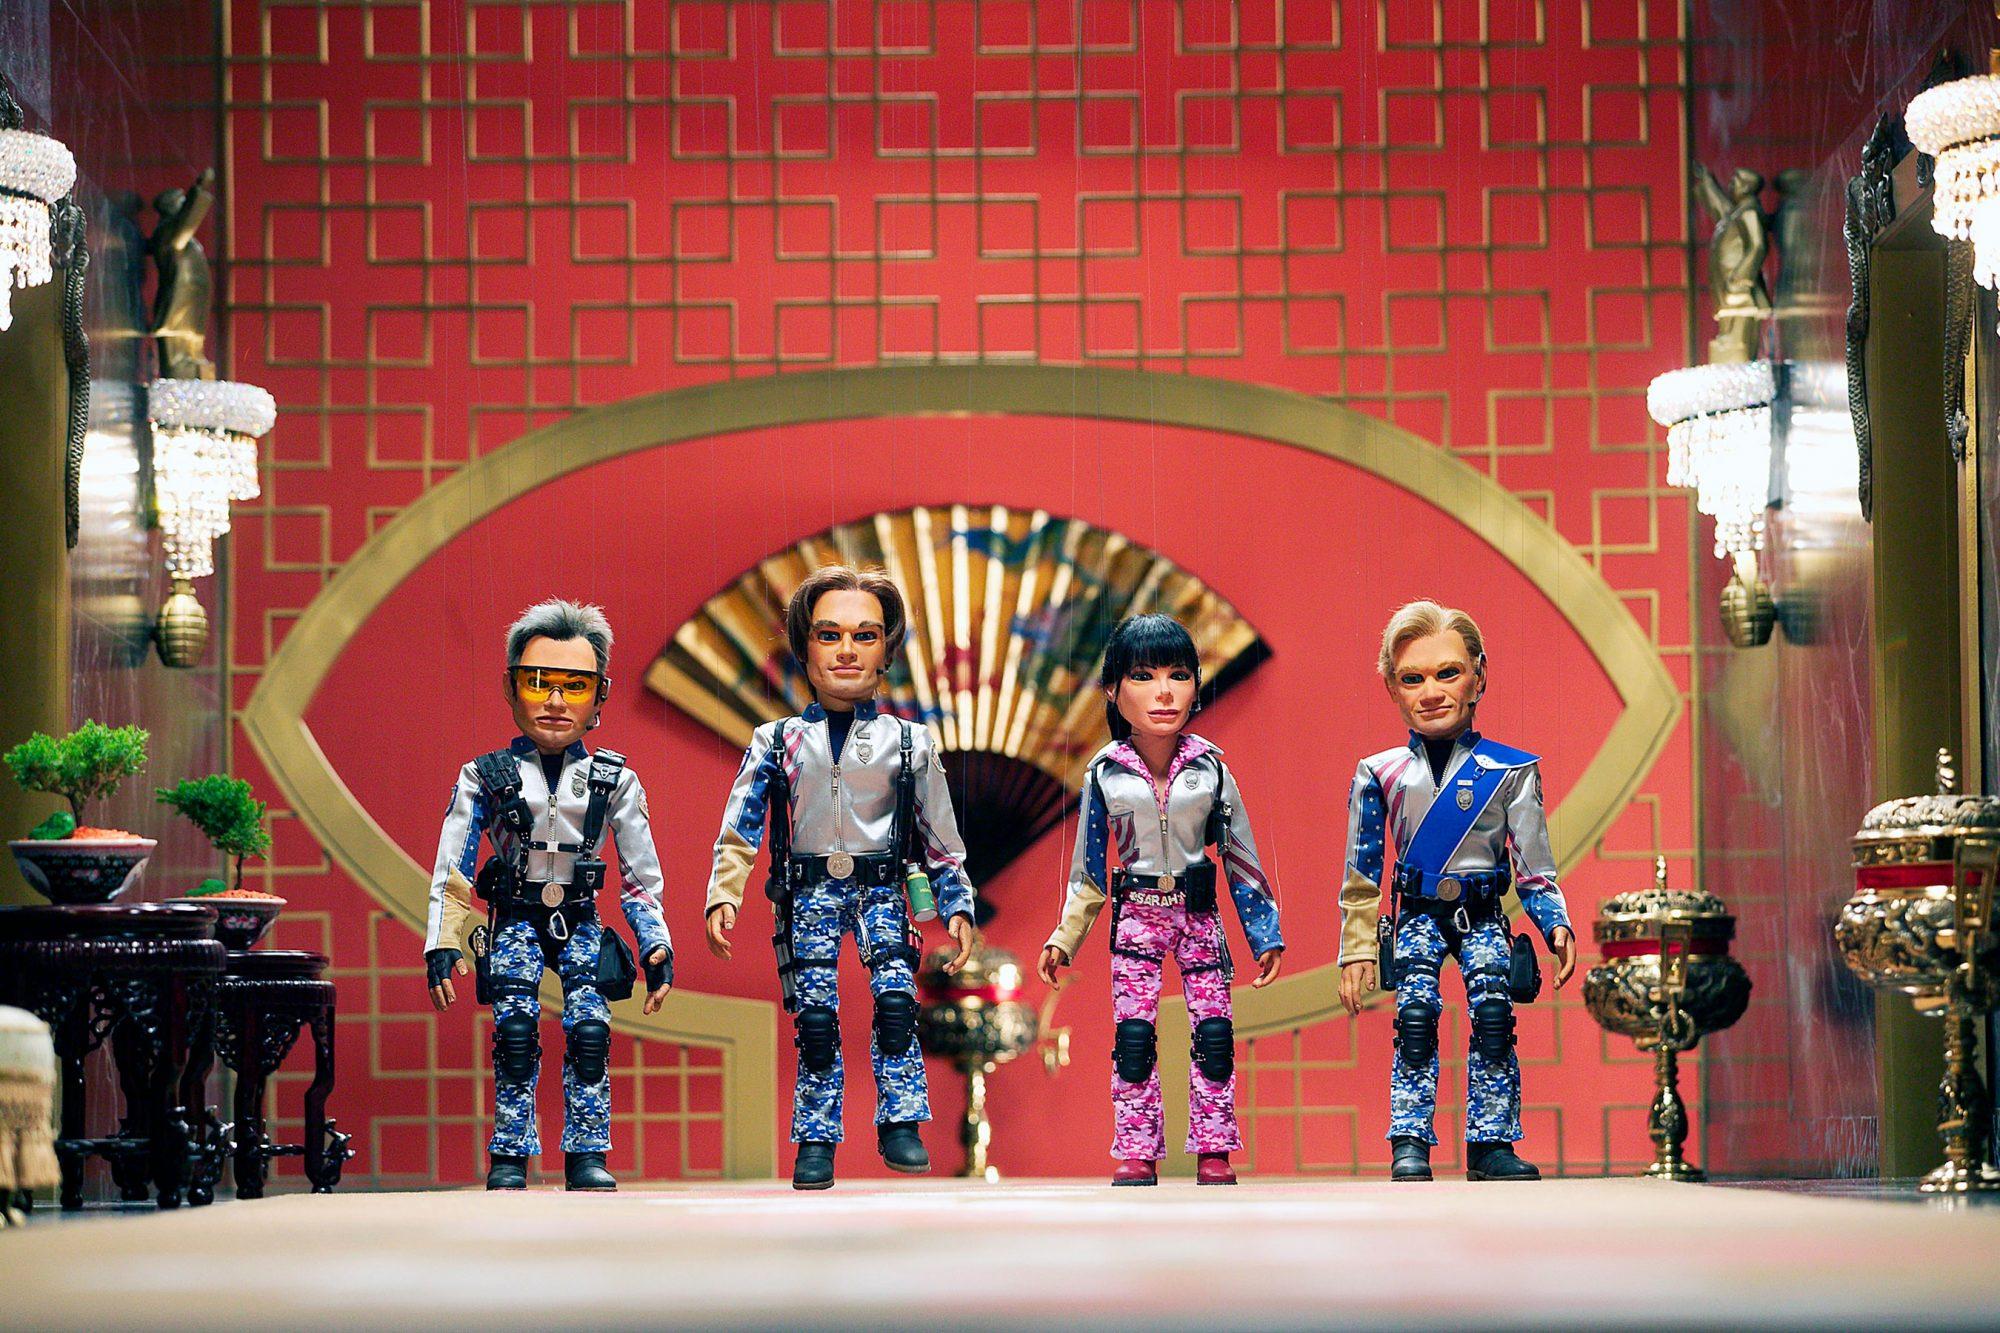 TEAM AMERICA: WORLD POLICE, Chris, Gary, Sarah, Joe, 2004, (c) Paramount/courtesy Everett Collection